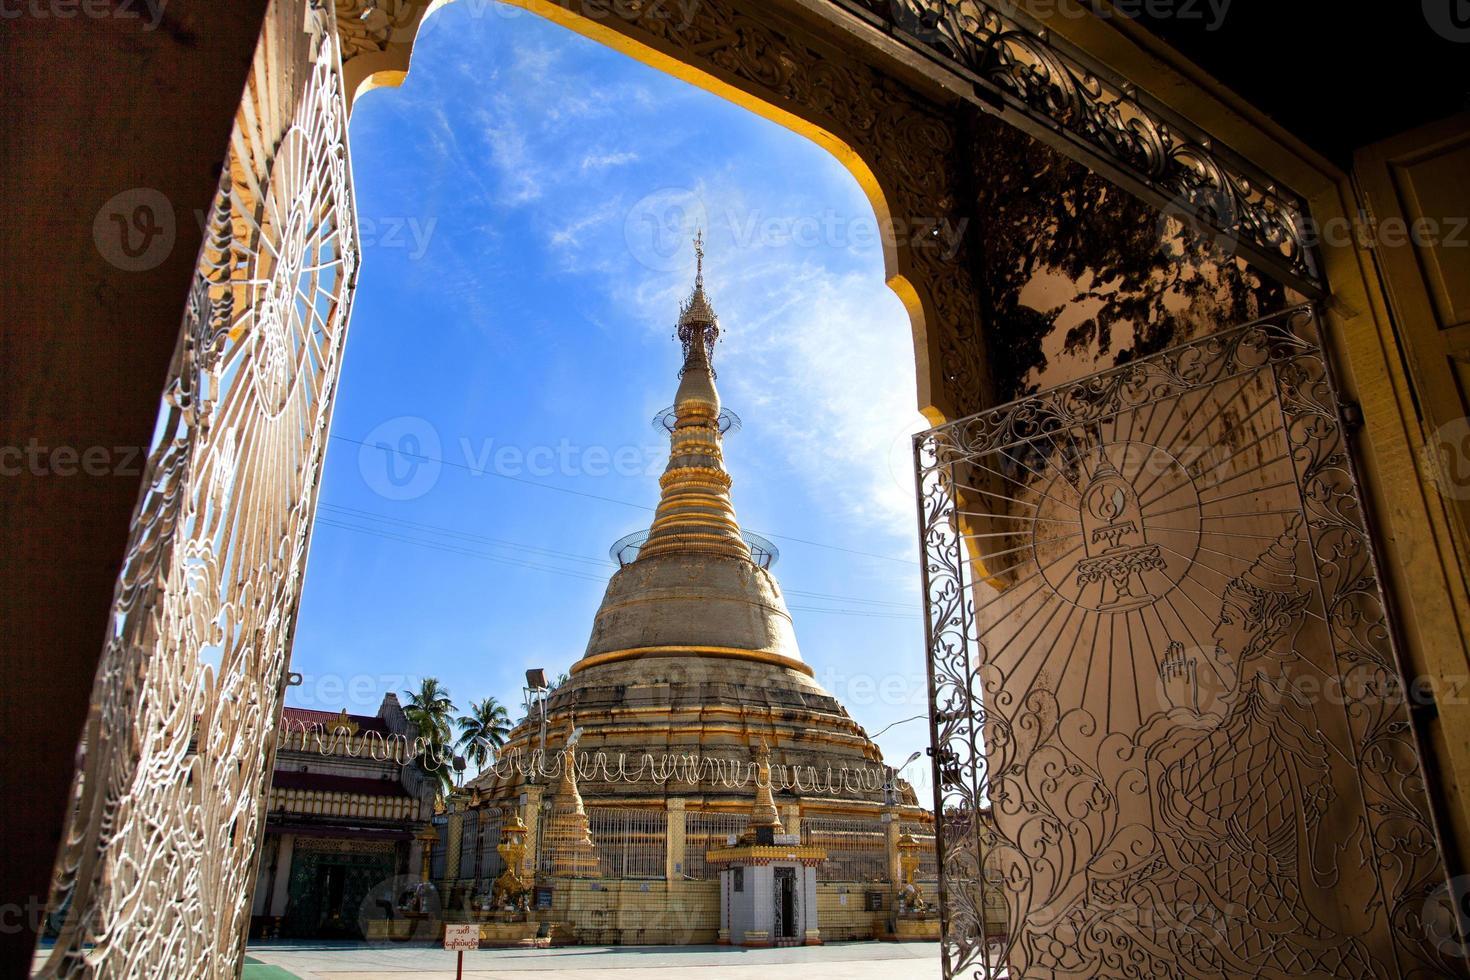 Botahtaung Pagoda in Yangon, Myanmar photo